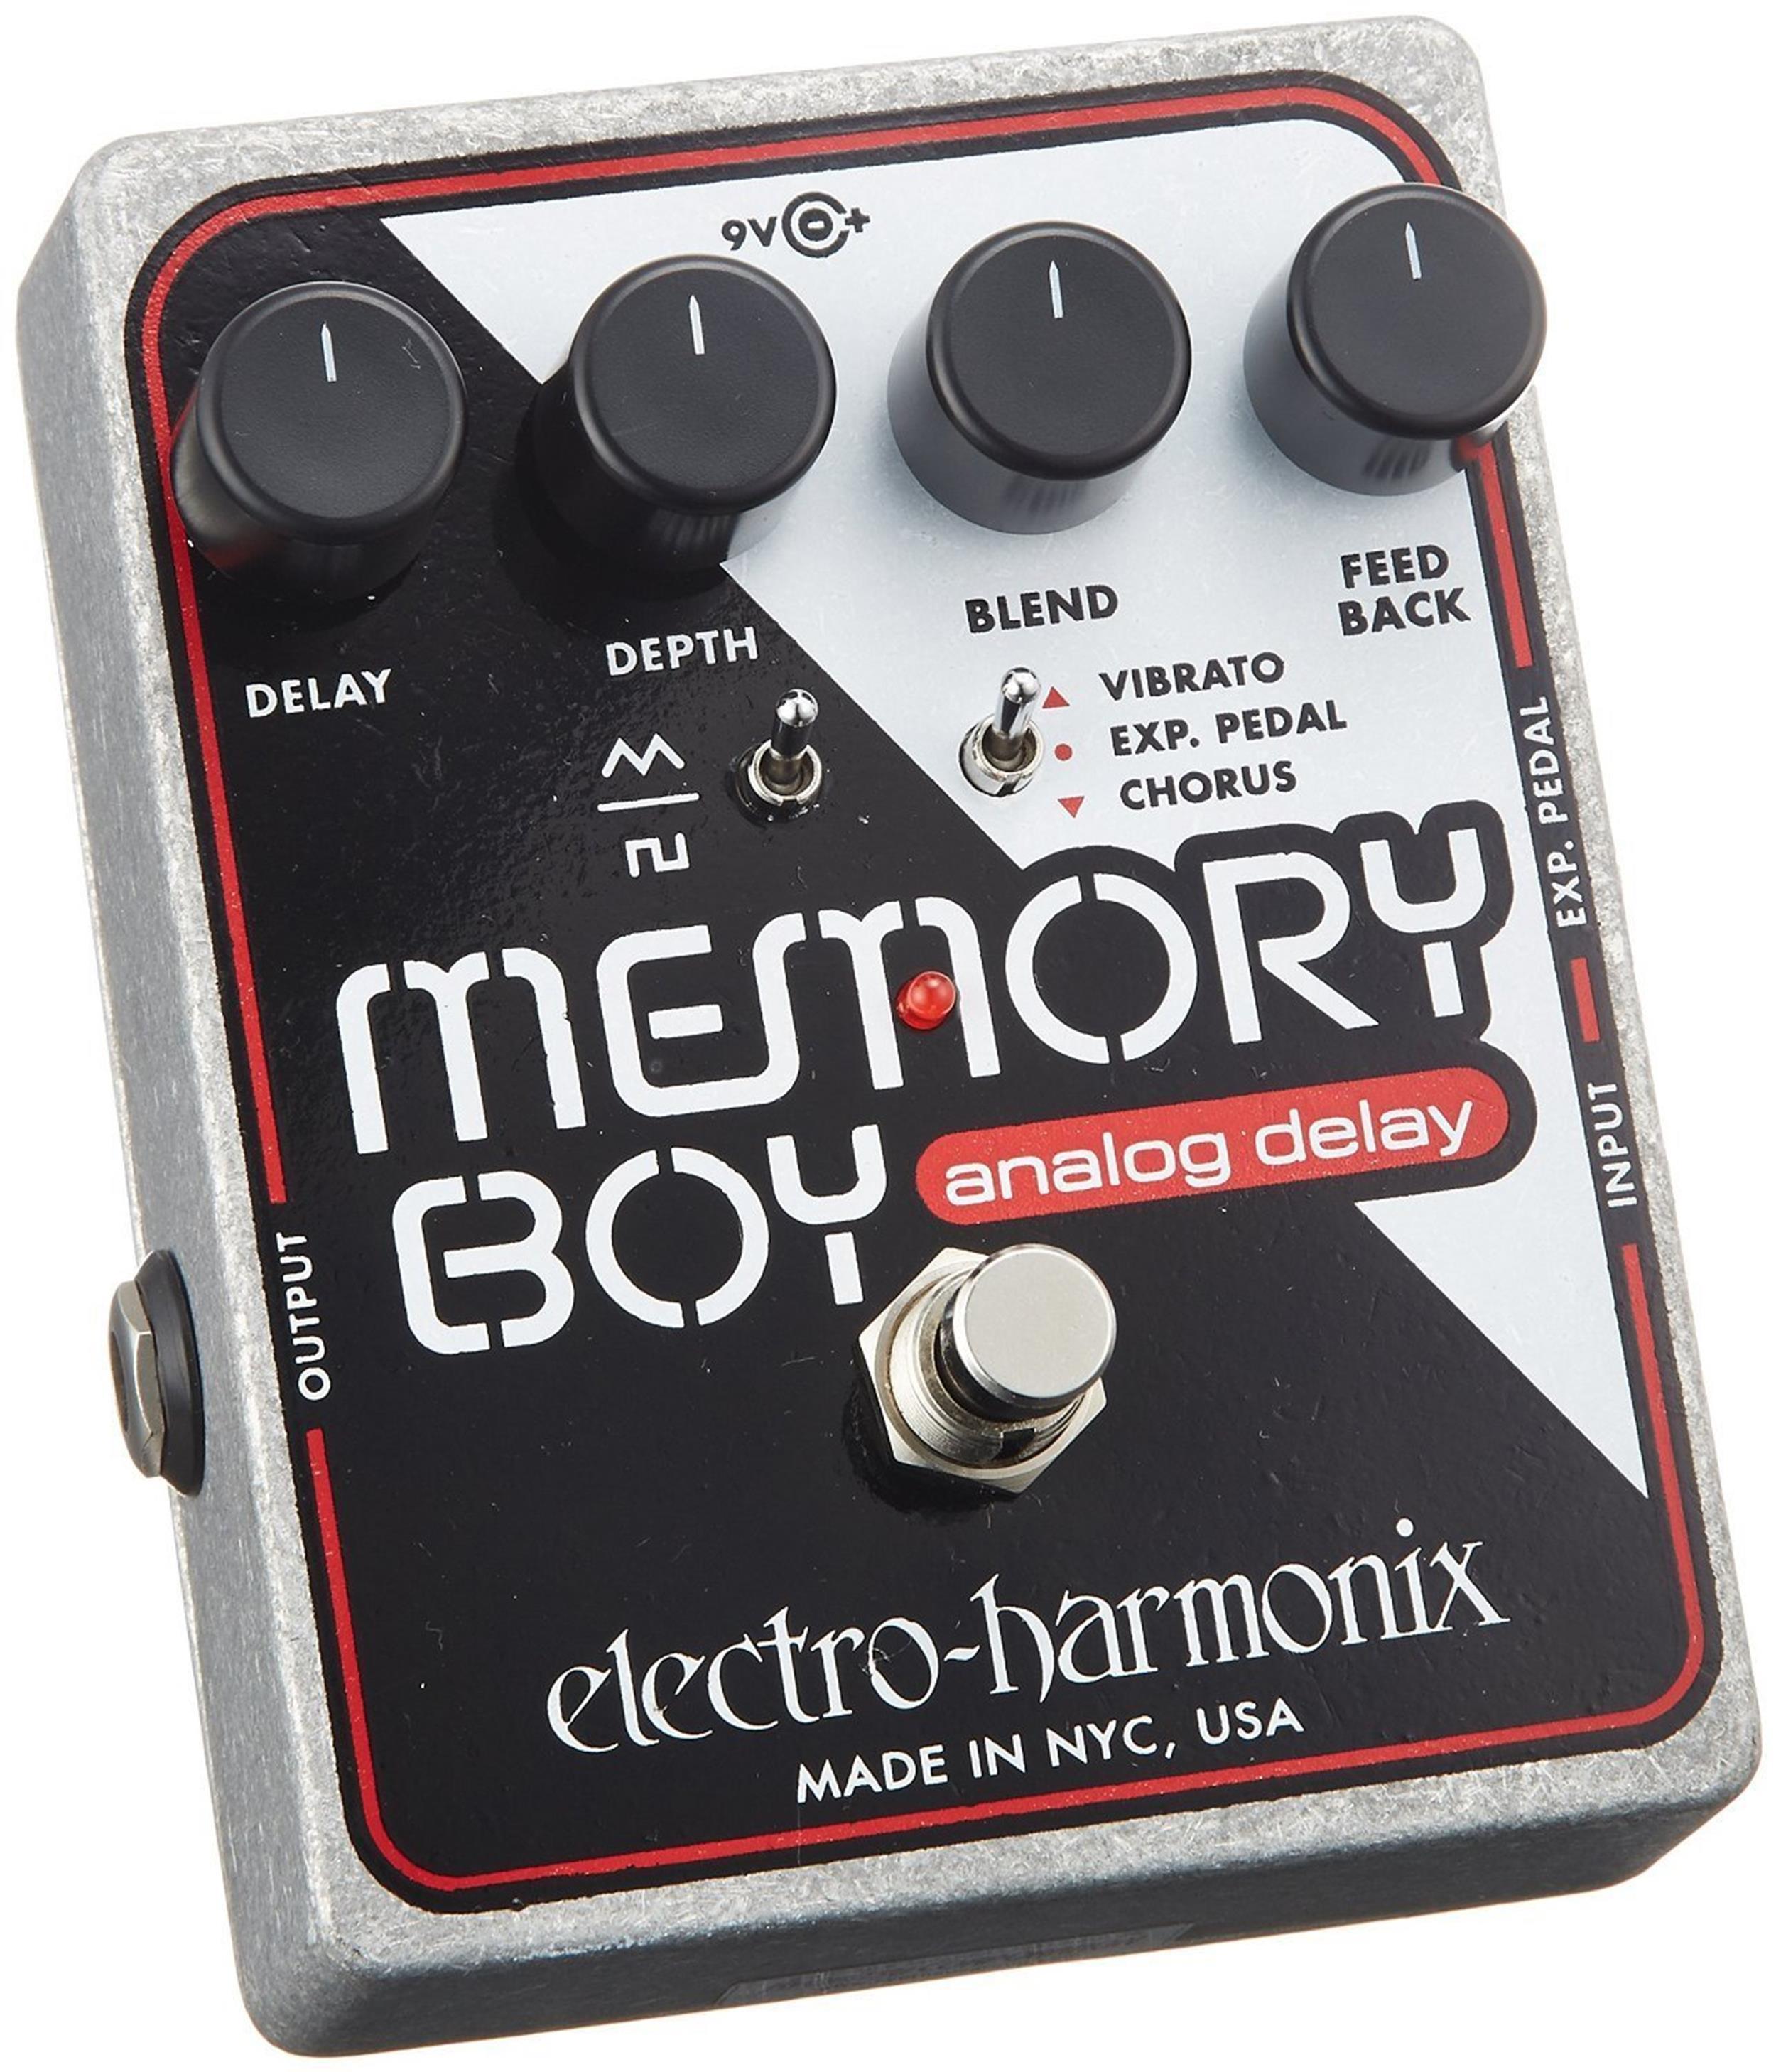 ELECTRO-HARMONIX-MEMORY-BOY-sku-3627